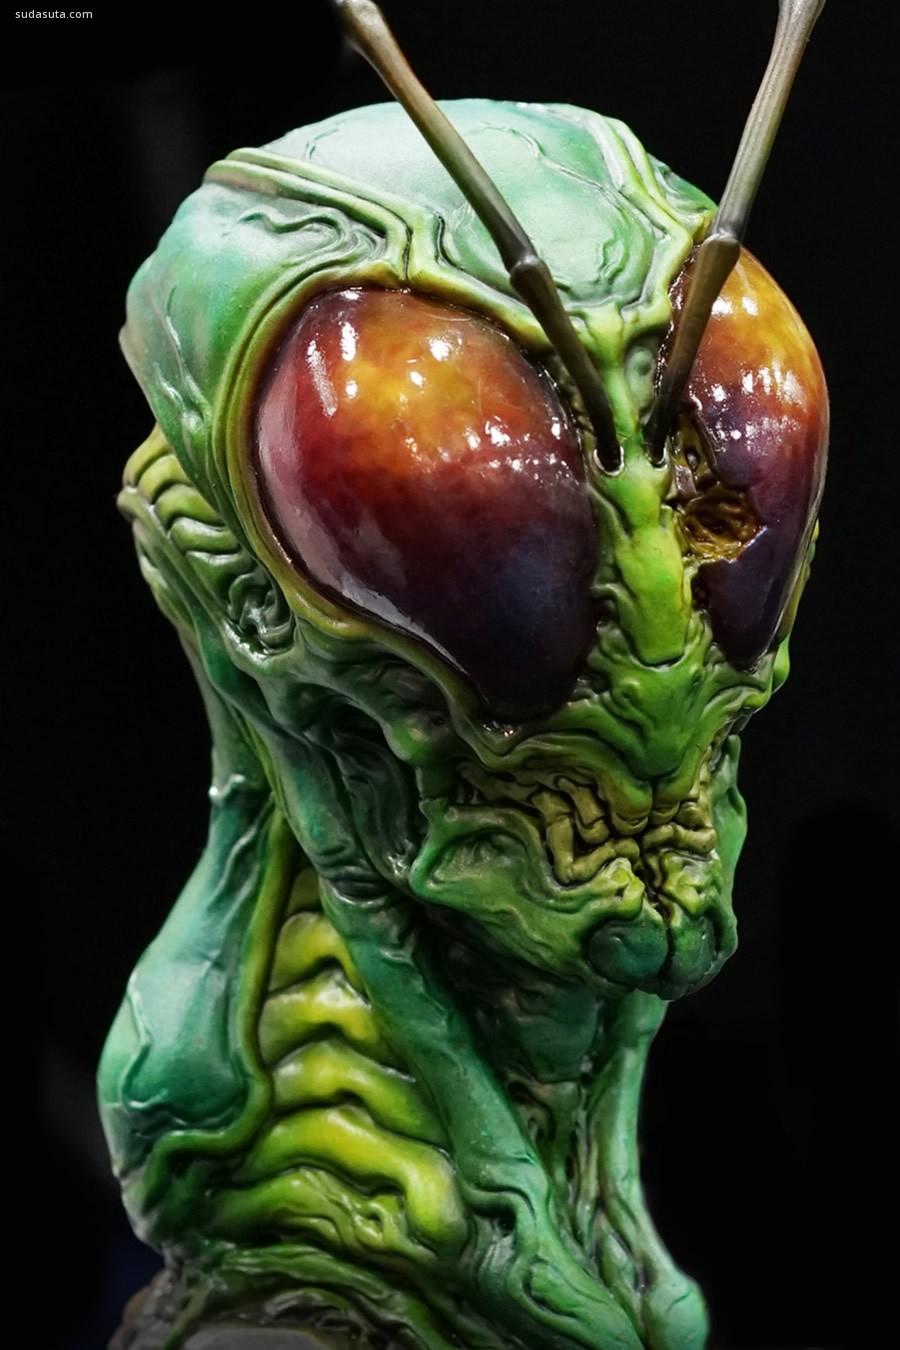 Dominic Qwek 邪恶的3D怪物设计欣赏